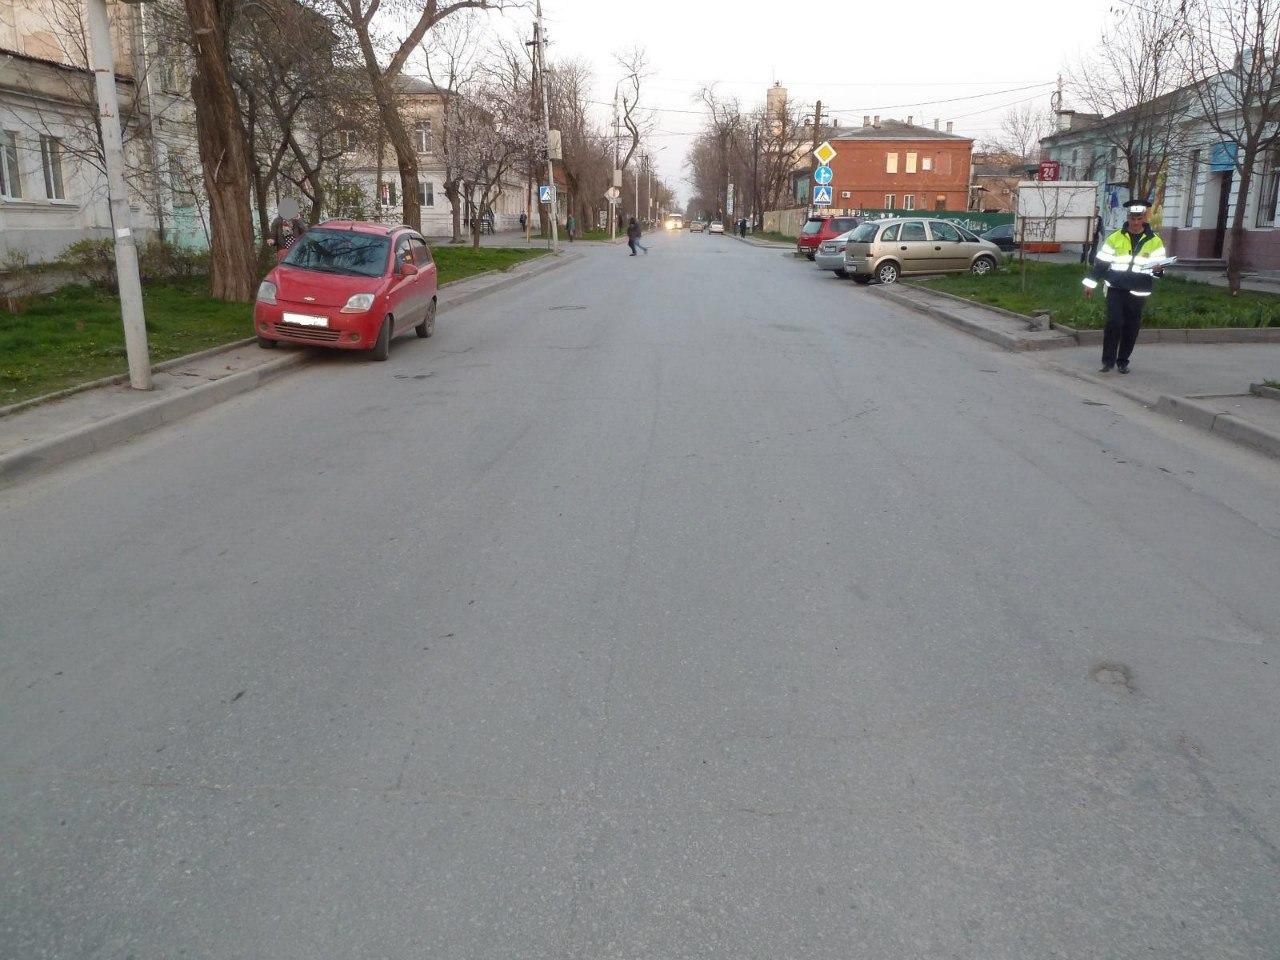 В Таганроге дама на Chevrolet Spark сбила ребенка